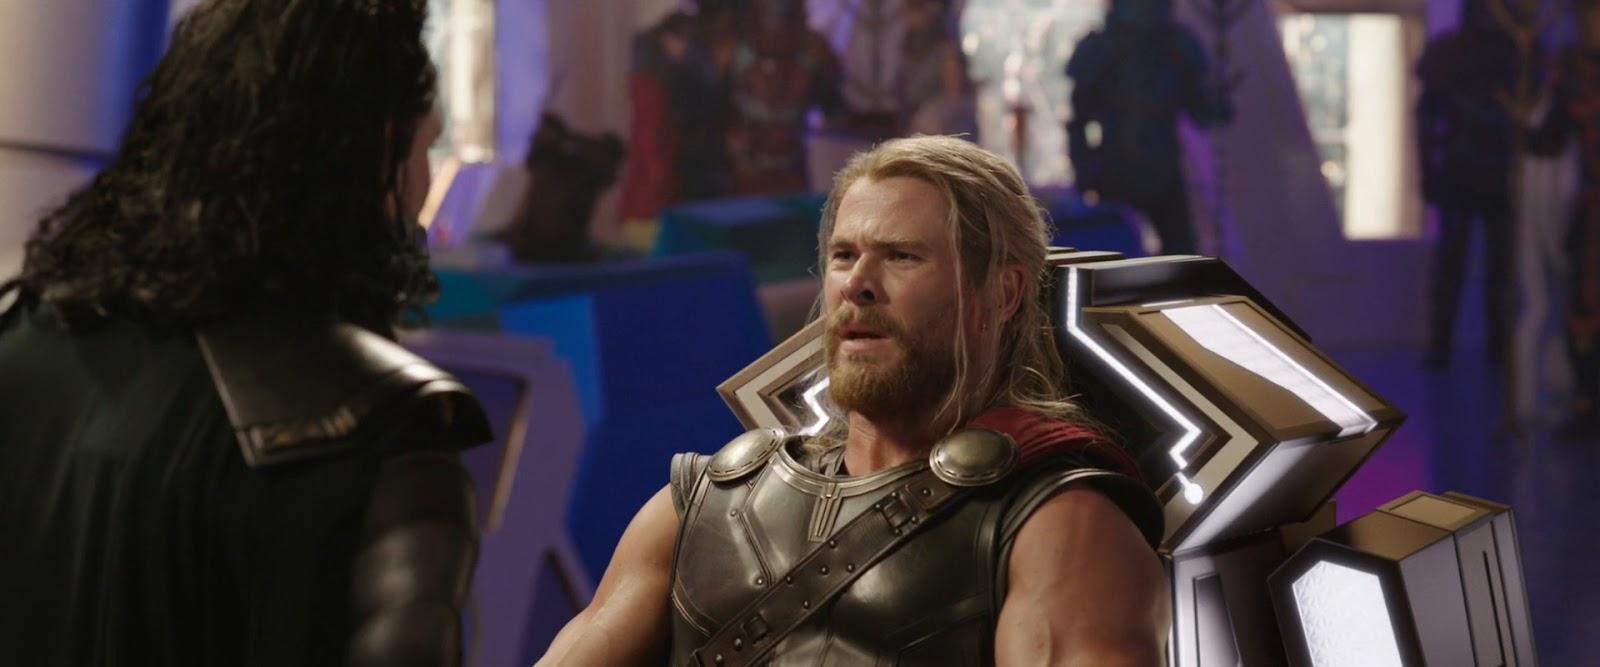 Thor: Ragnarok (2017) 2